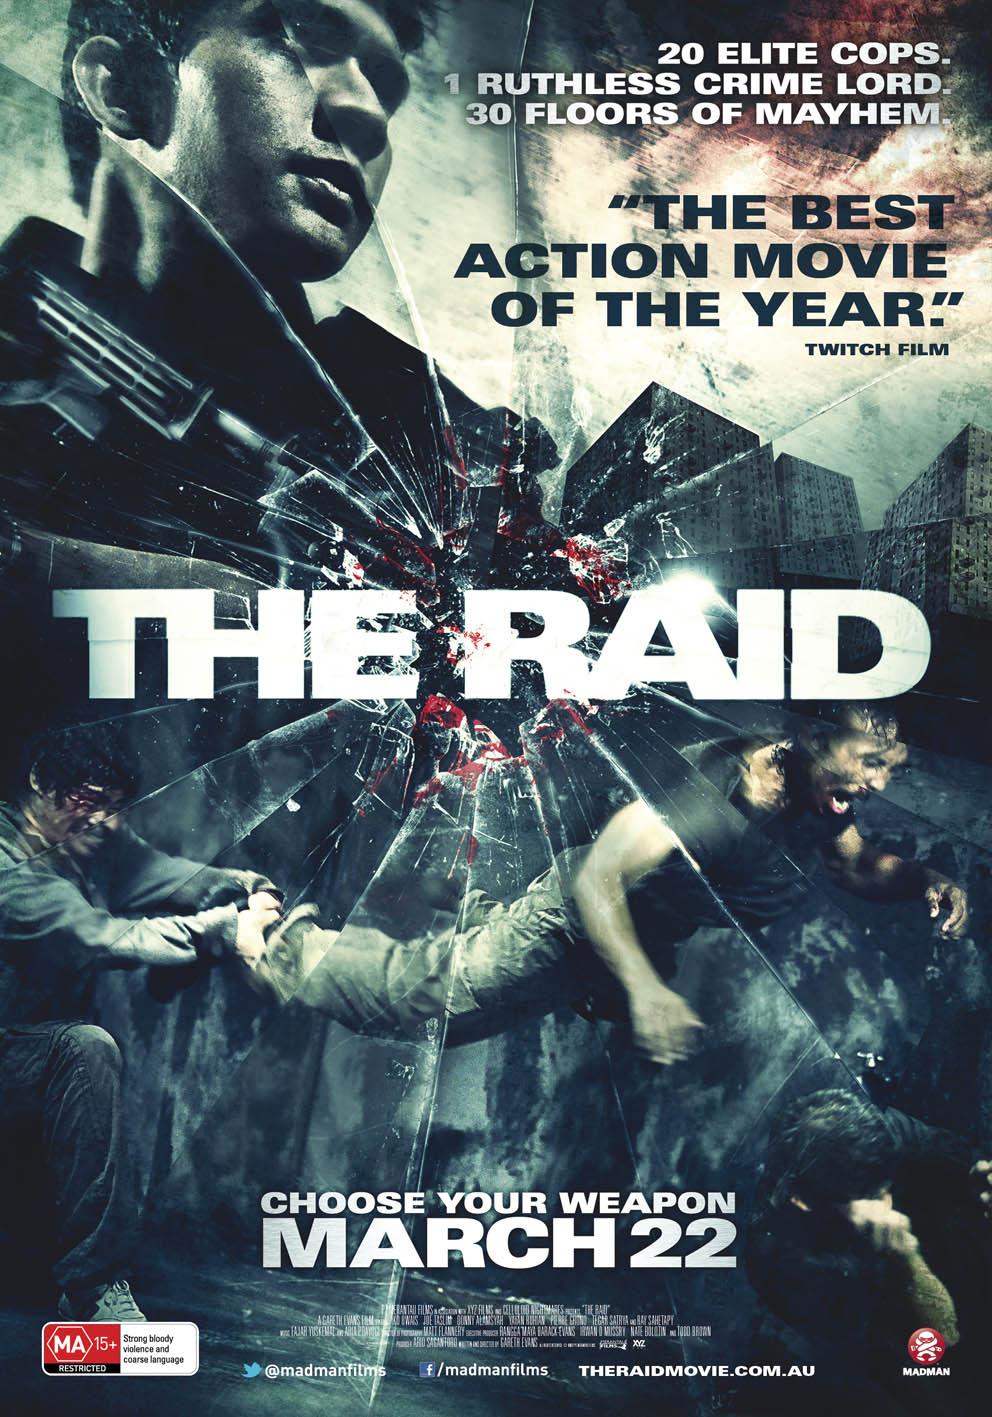 [MULTI] The Raid (2012) [TRUEFRENCH] (AC3) [BRRip]